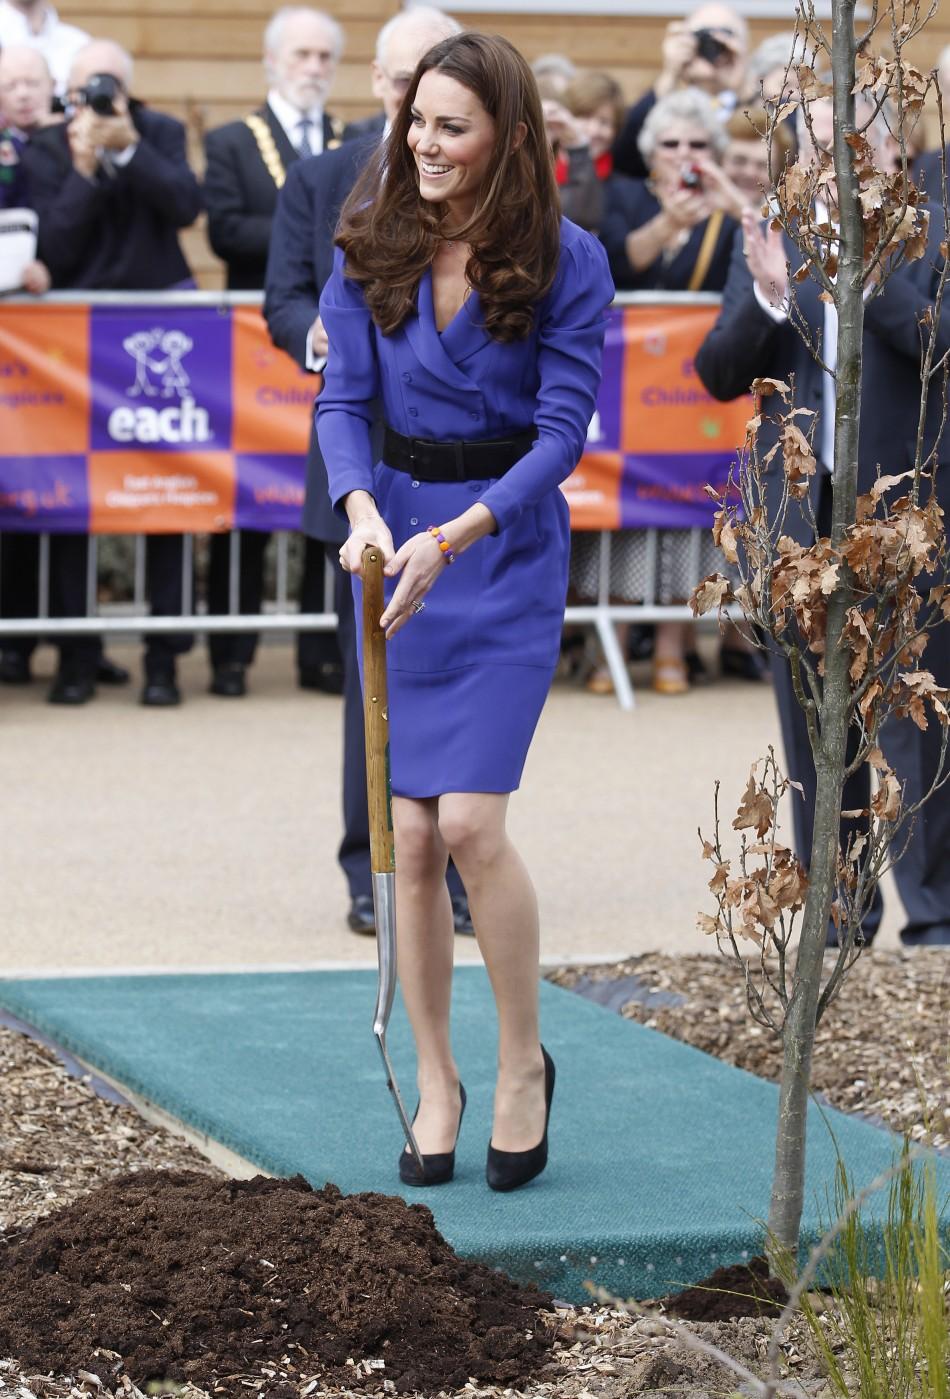 Hands On Shovel From Kate Middleton To Princess Letizia